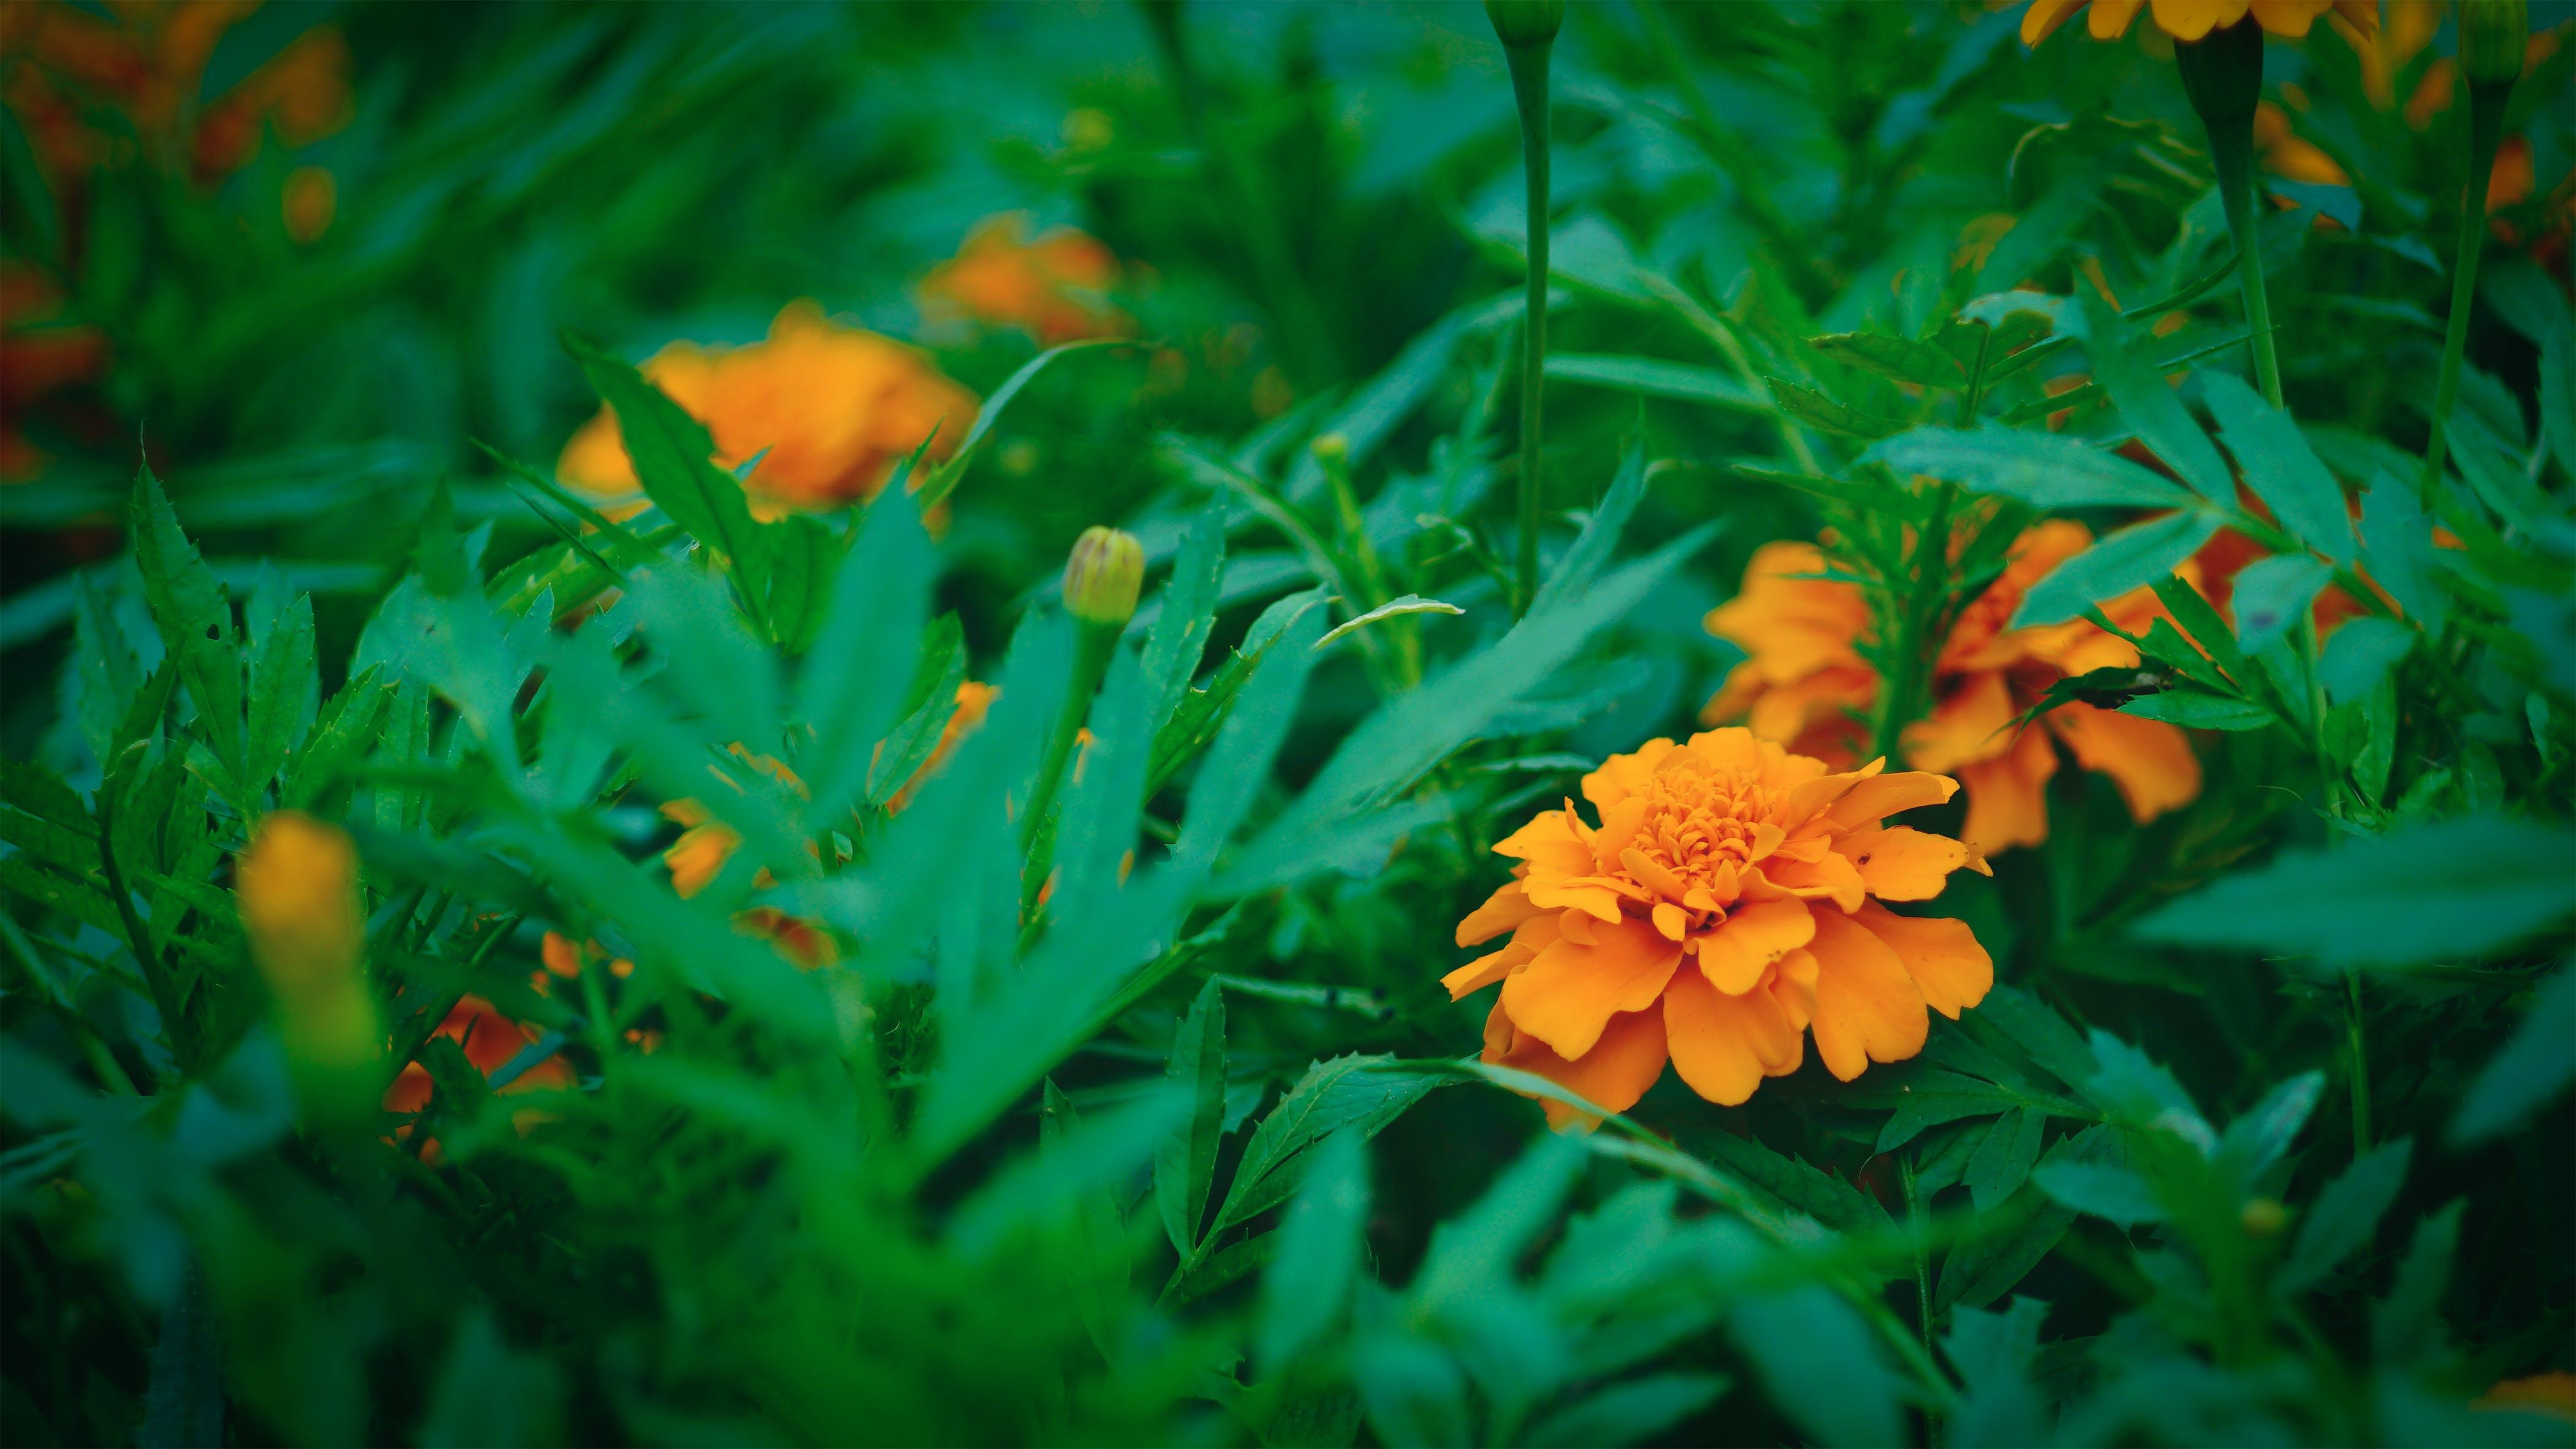 Free stock photo of nature, garden, park, flower